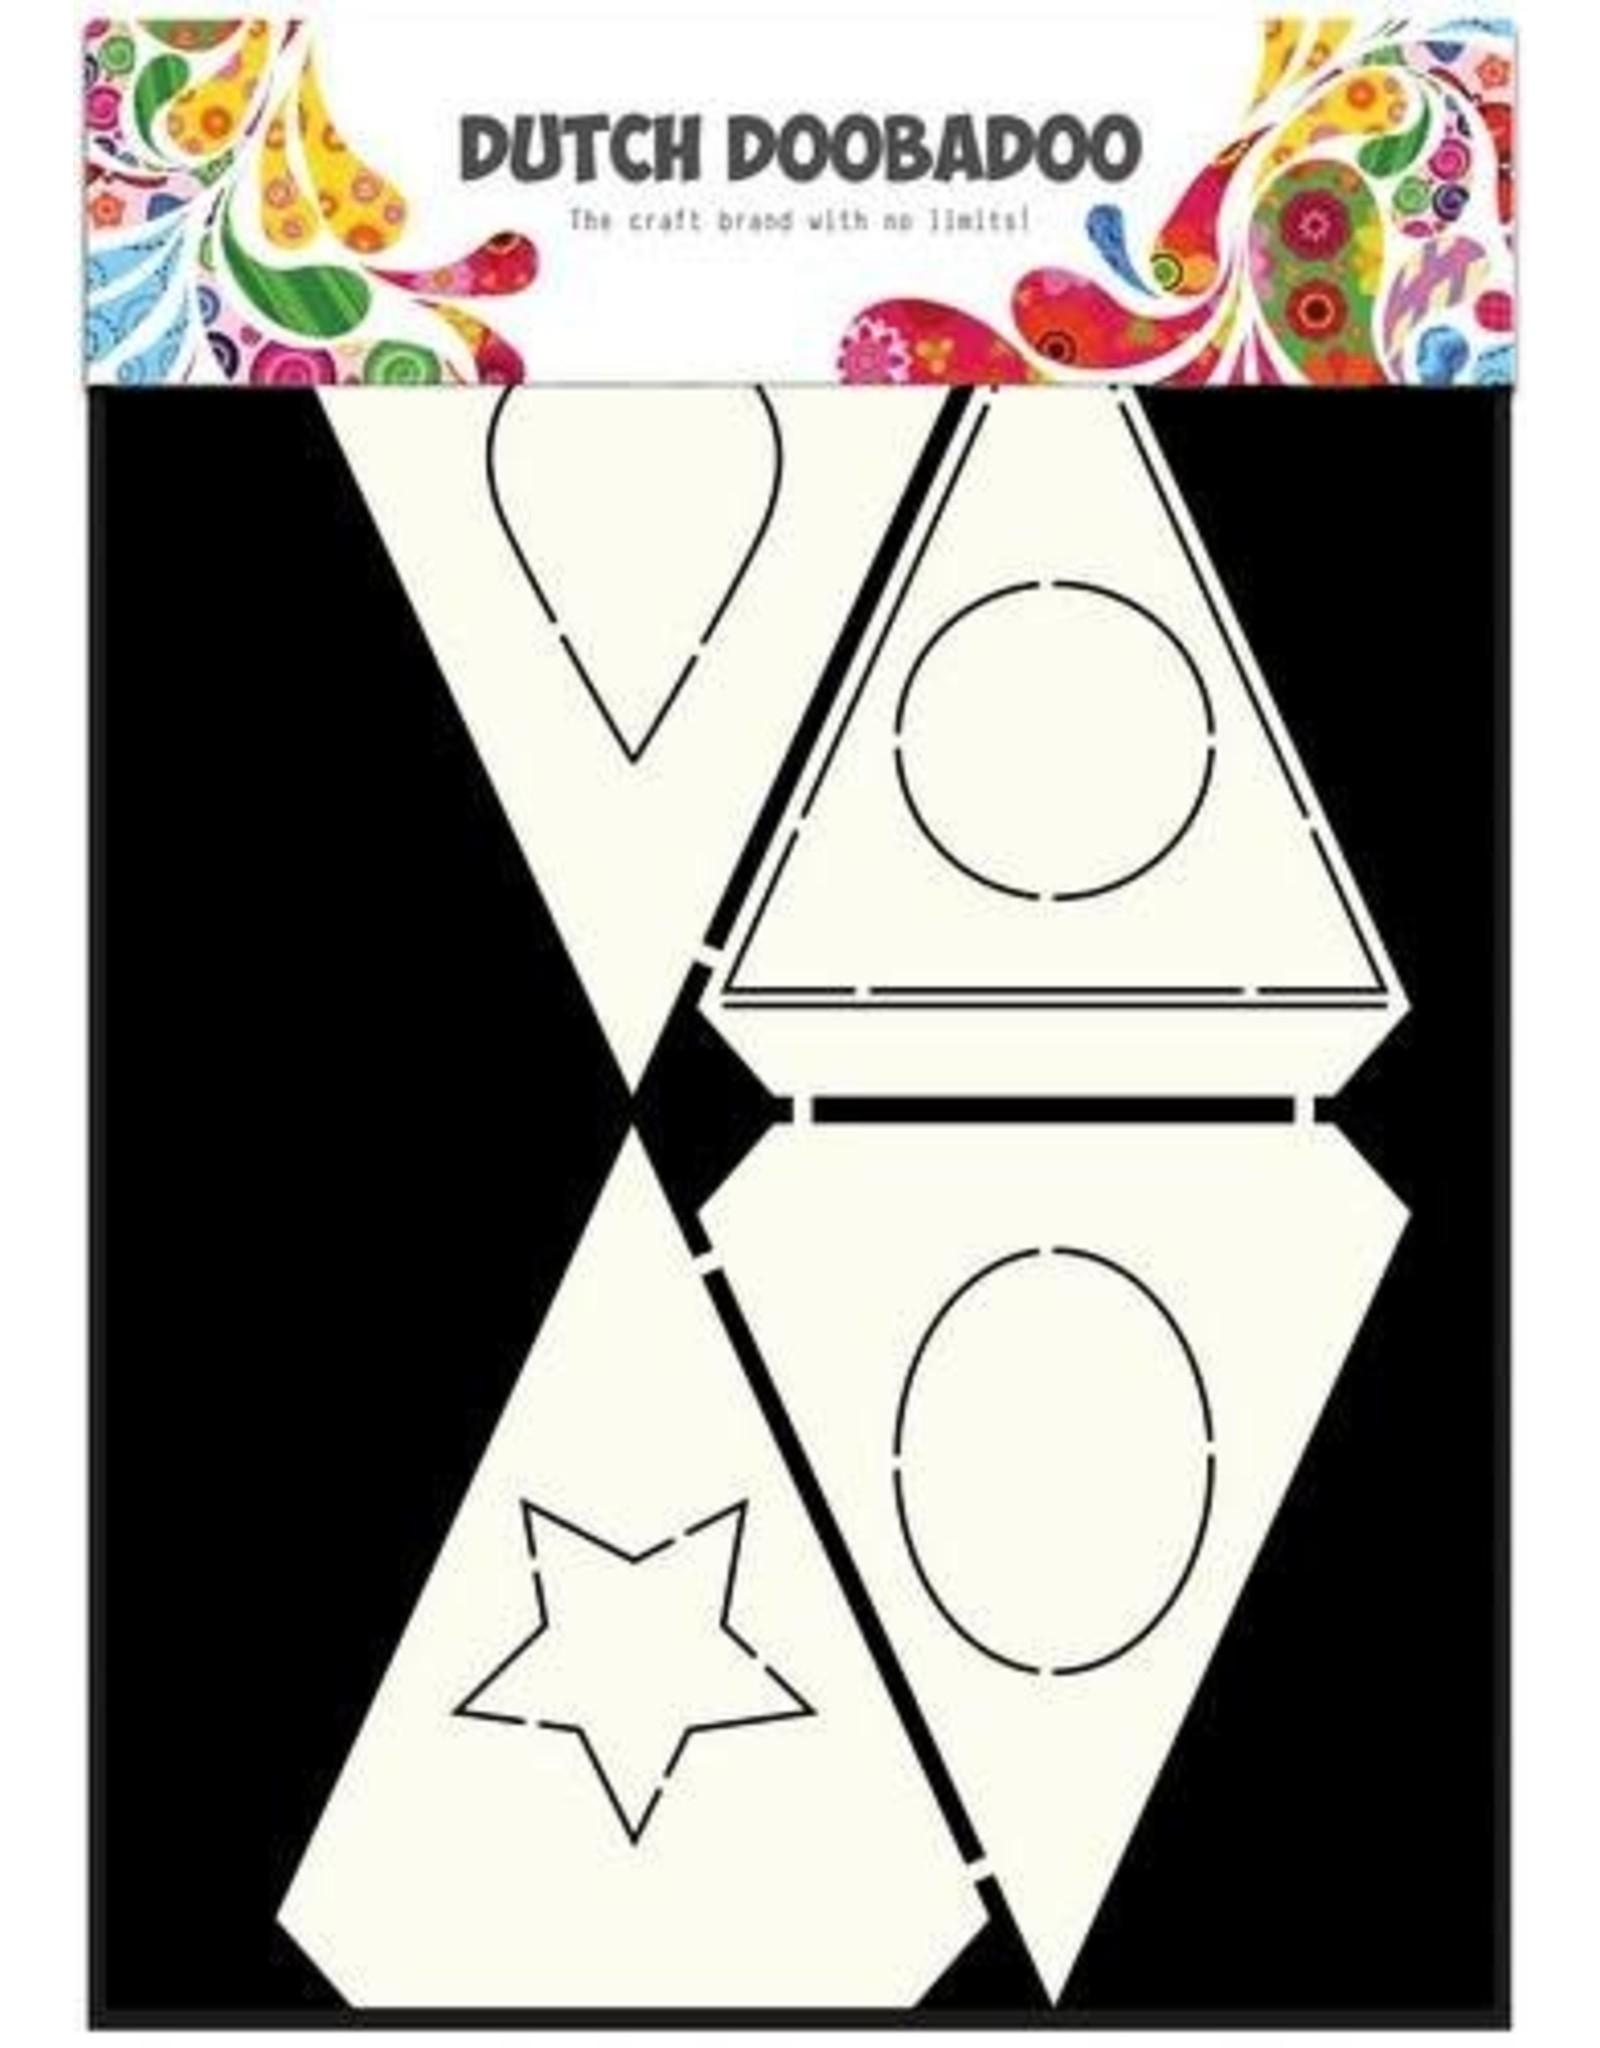 Dutch Doobadoo Card Art Dutch Doobadoo Dutch Card Art Stencil Shapes A4